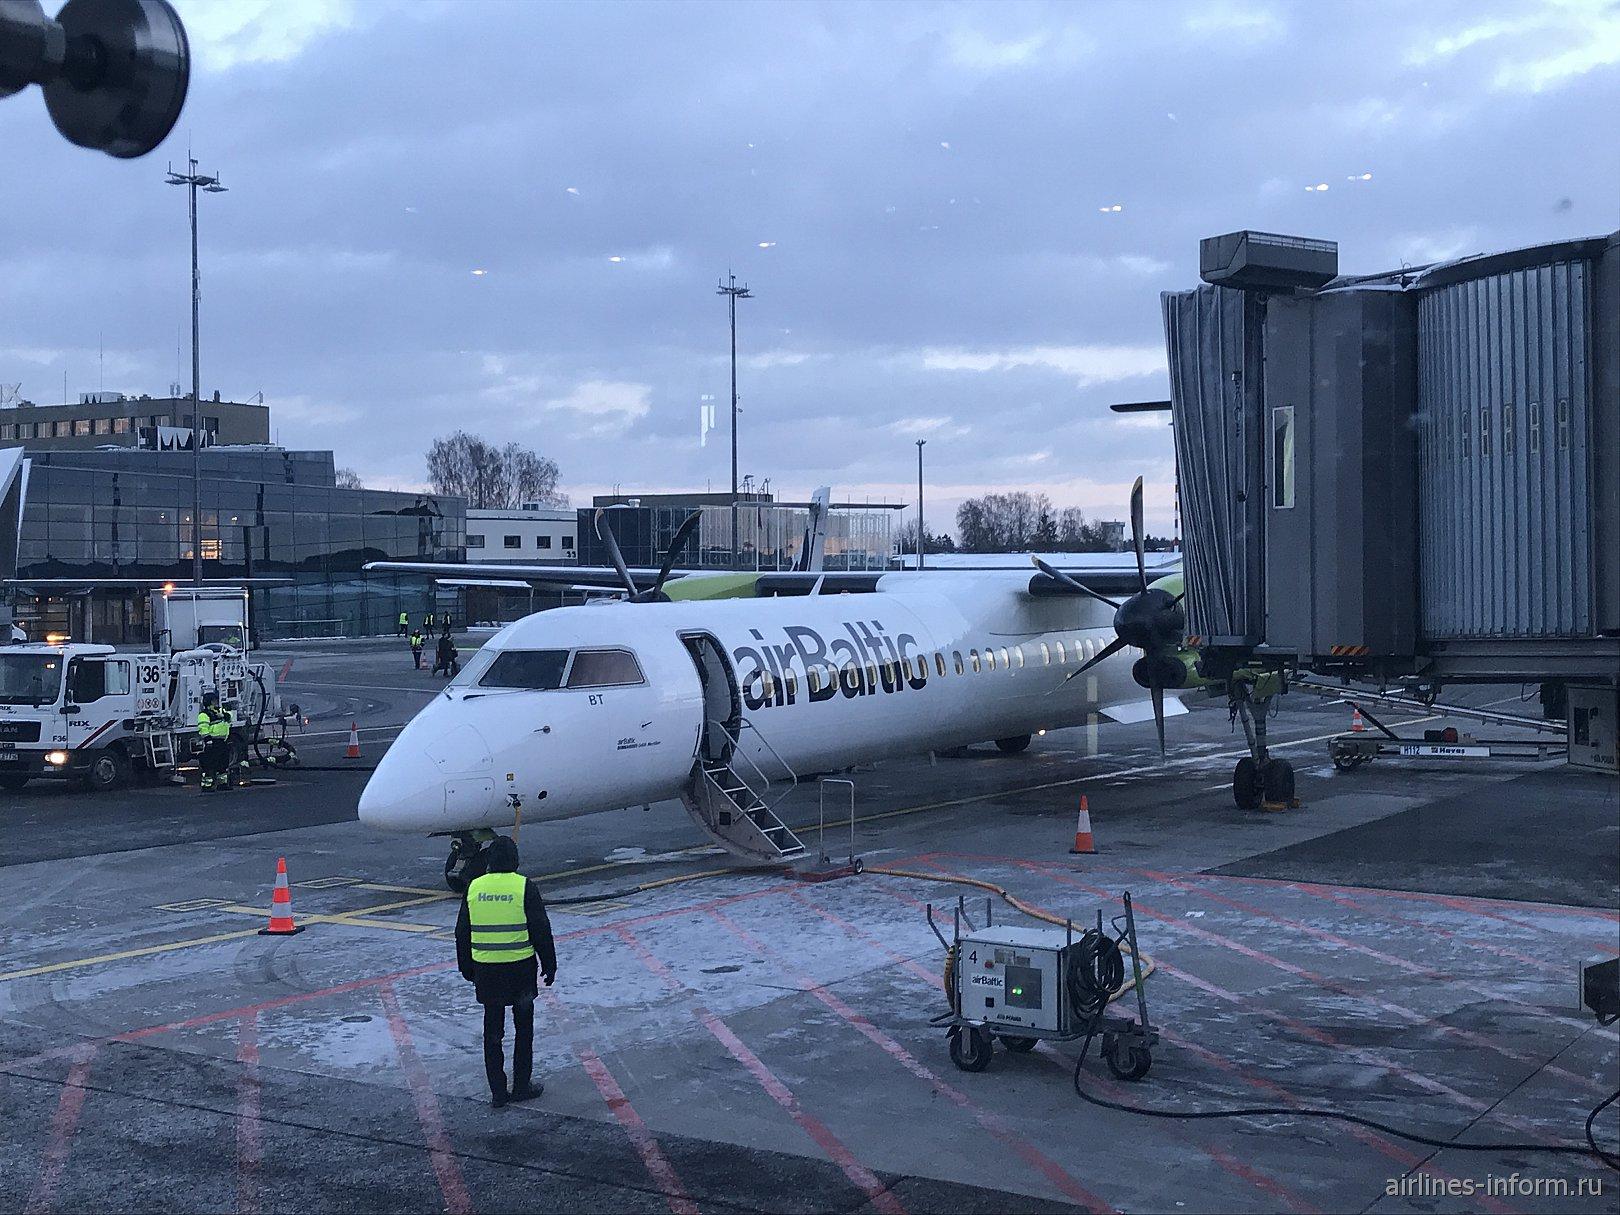 Будапешт - Рига на Bombardier Dash 8 Q400 авиакомпании Air Baltic (72 фото)